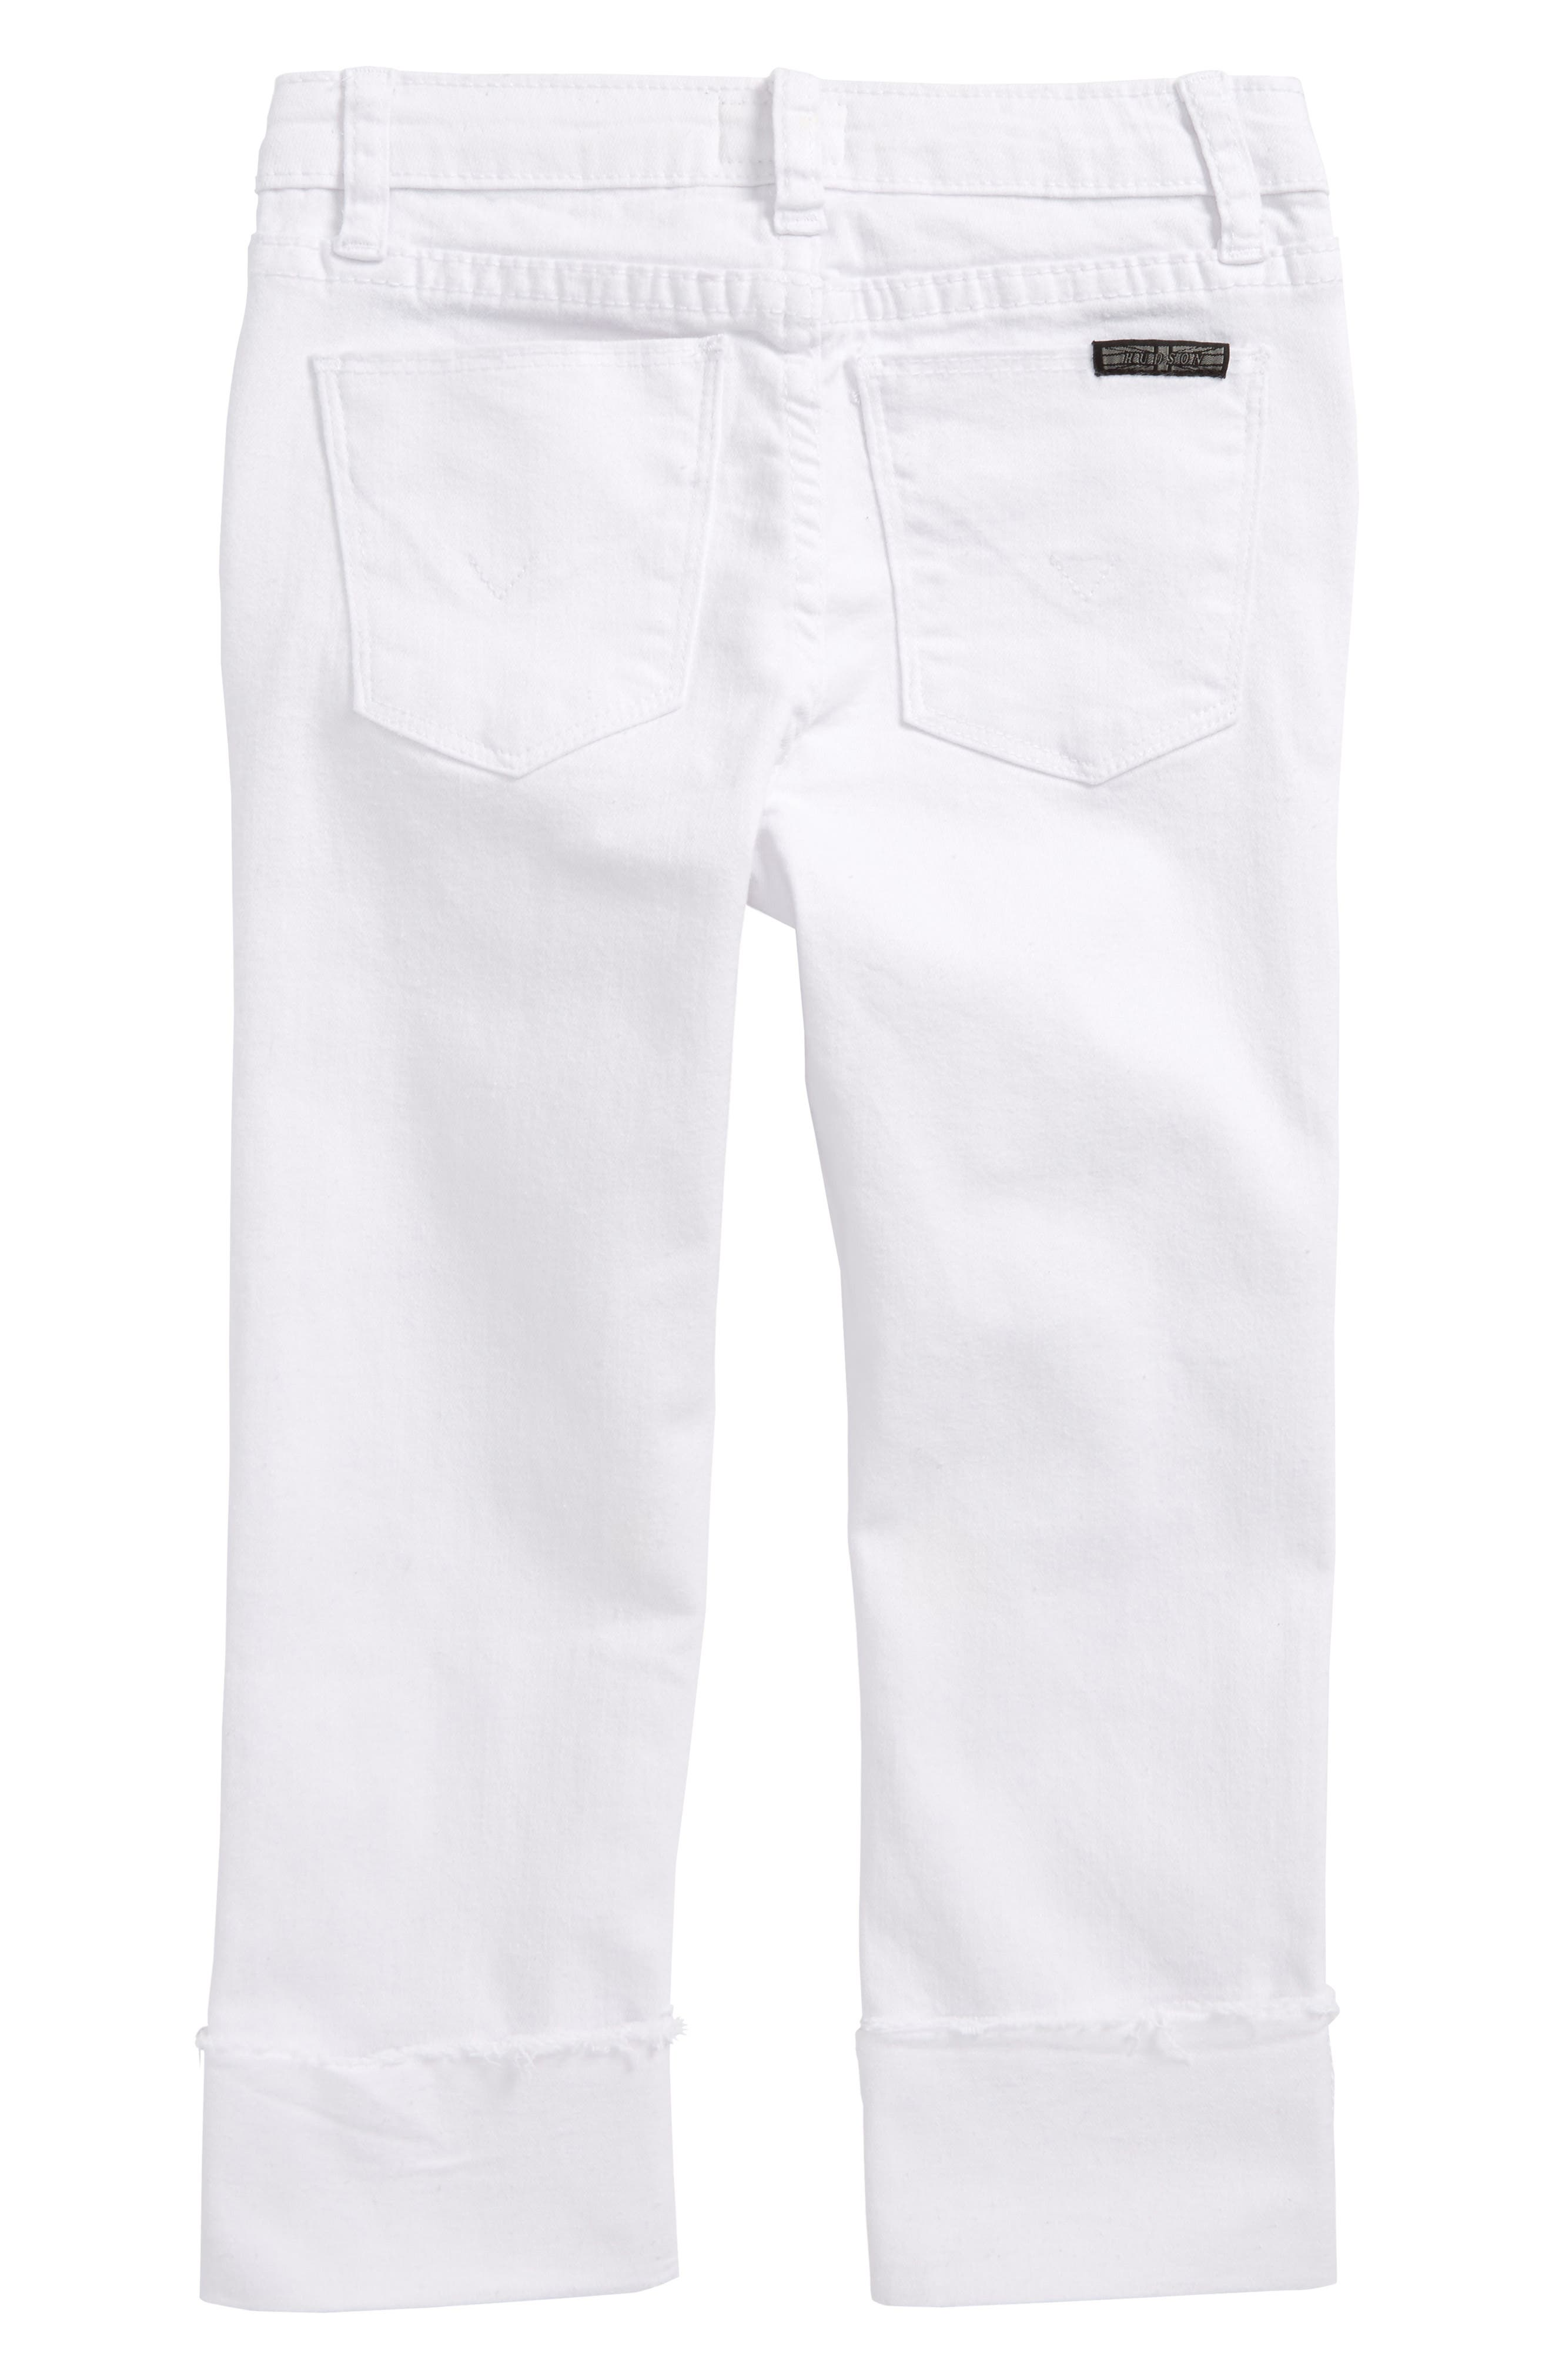 Jessa Crop Skinny Jeans,                             Alternate thumbnail 2, color,